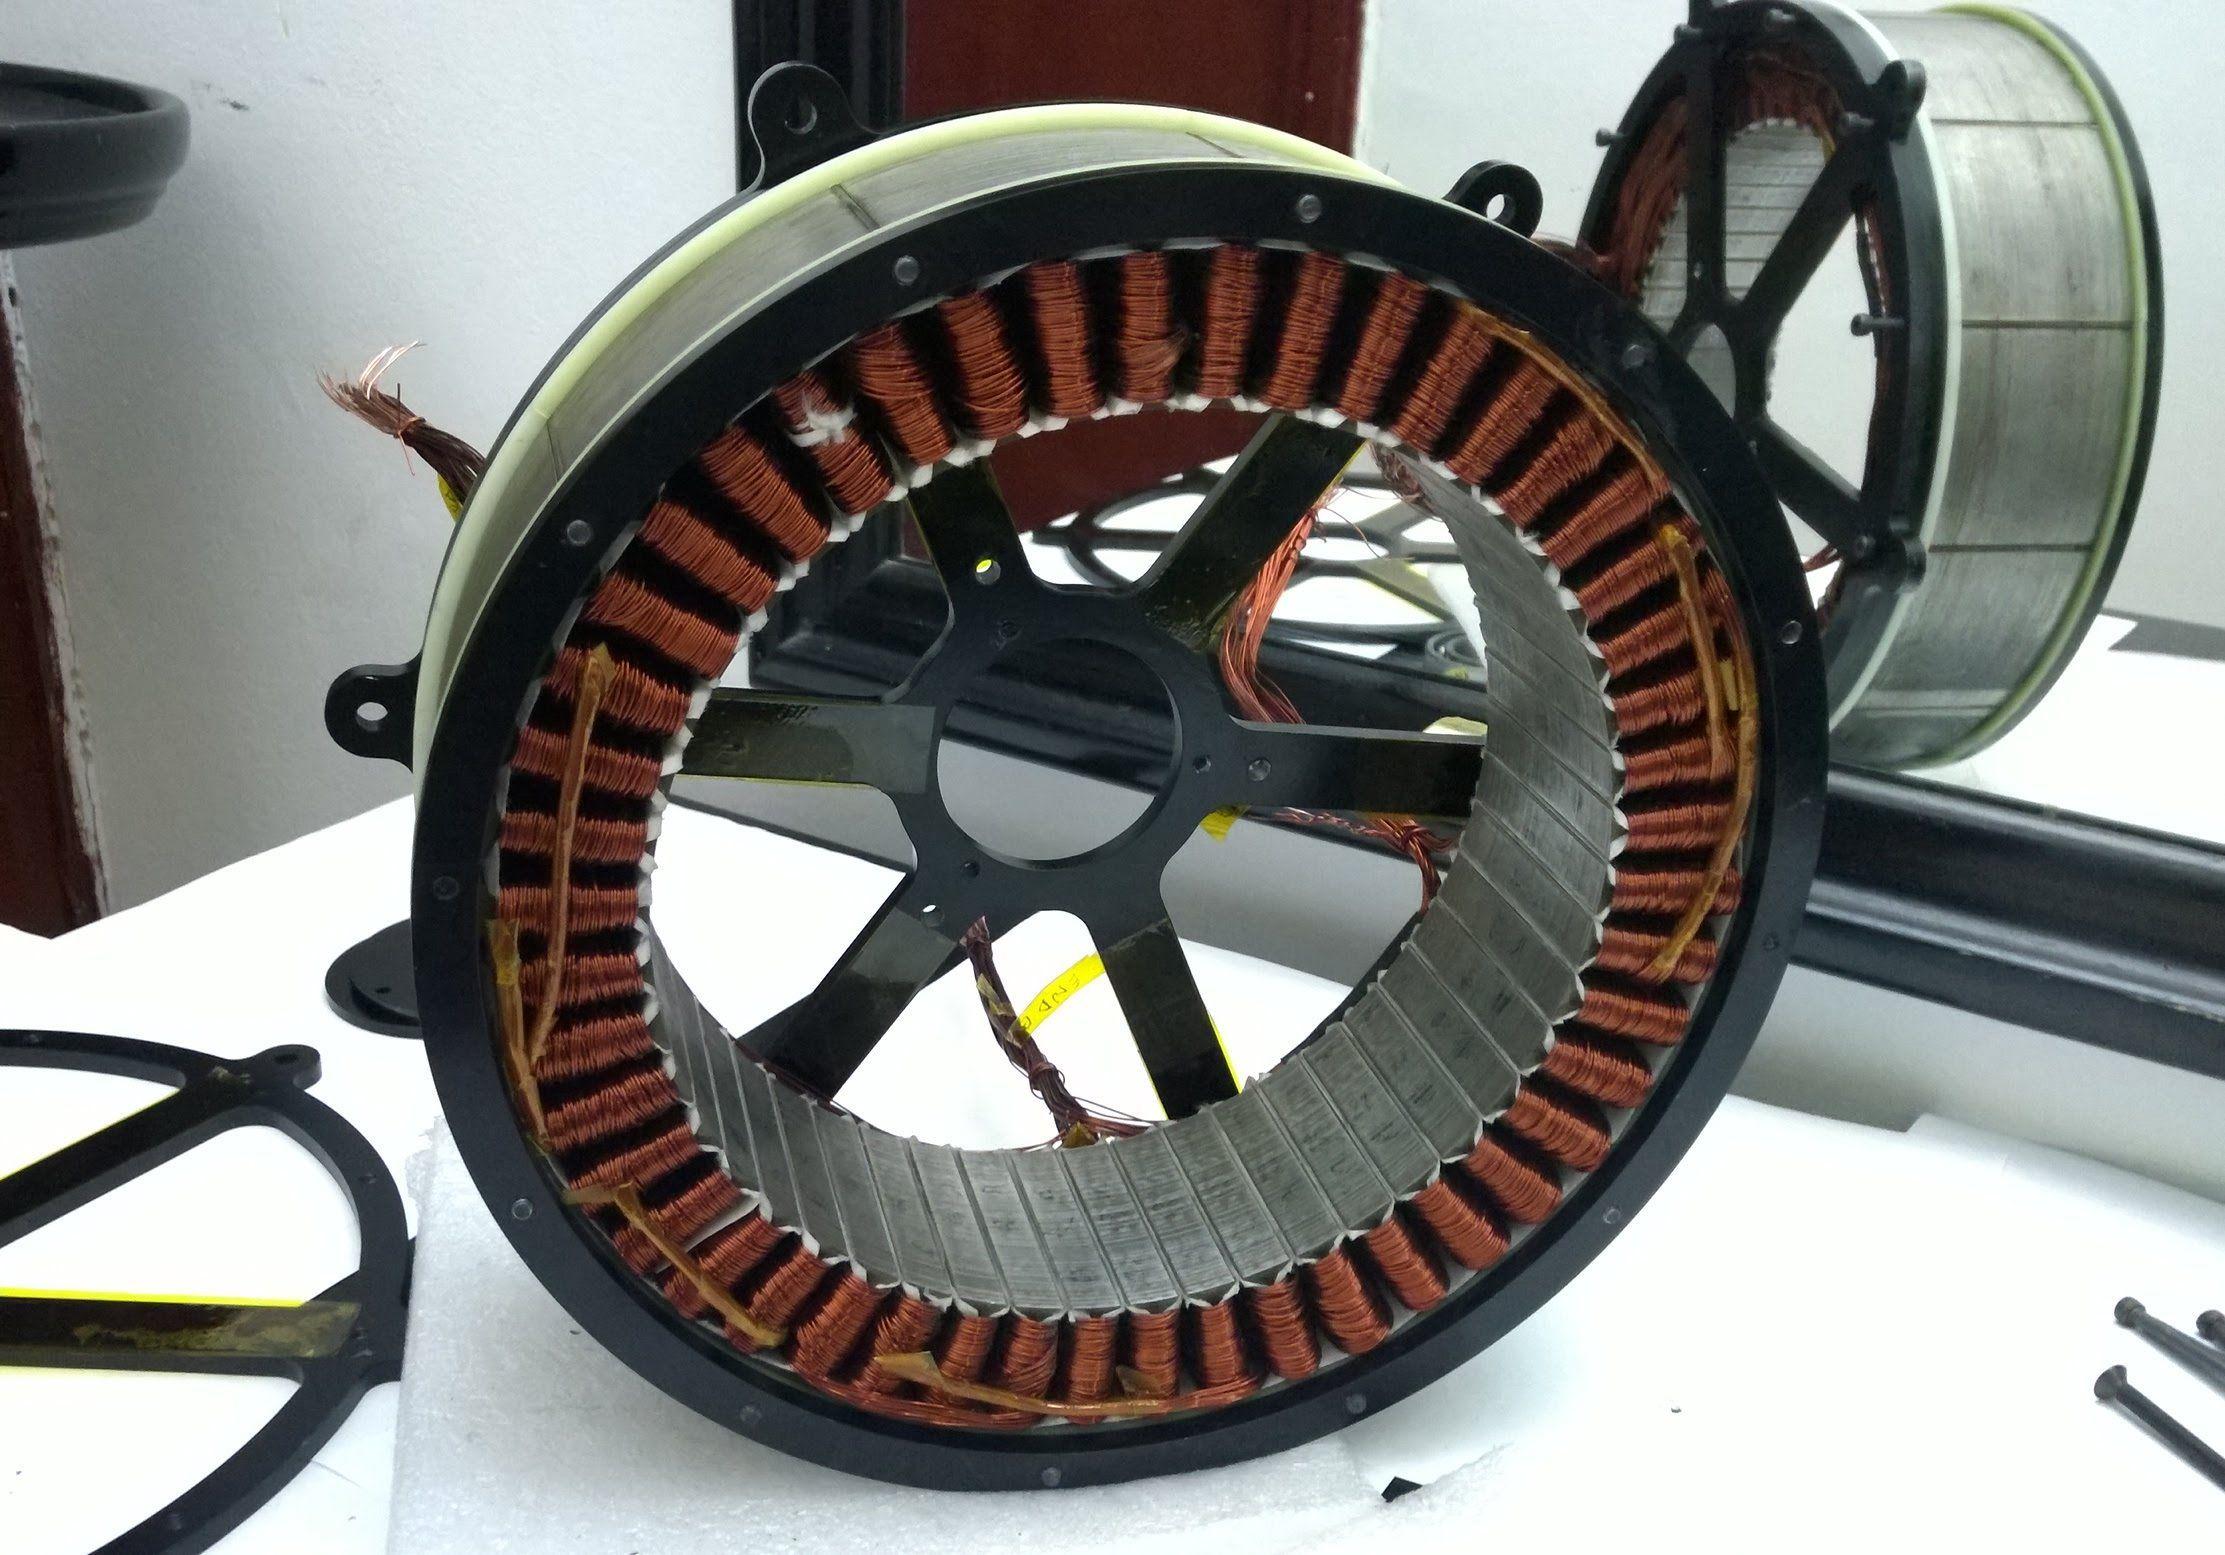 45kw Dc Brushless Motor Construction Electric Motor Electric Car Conversion Motor Generator